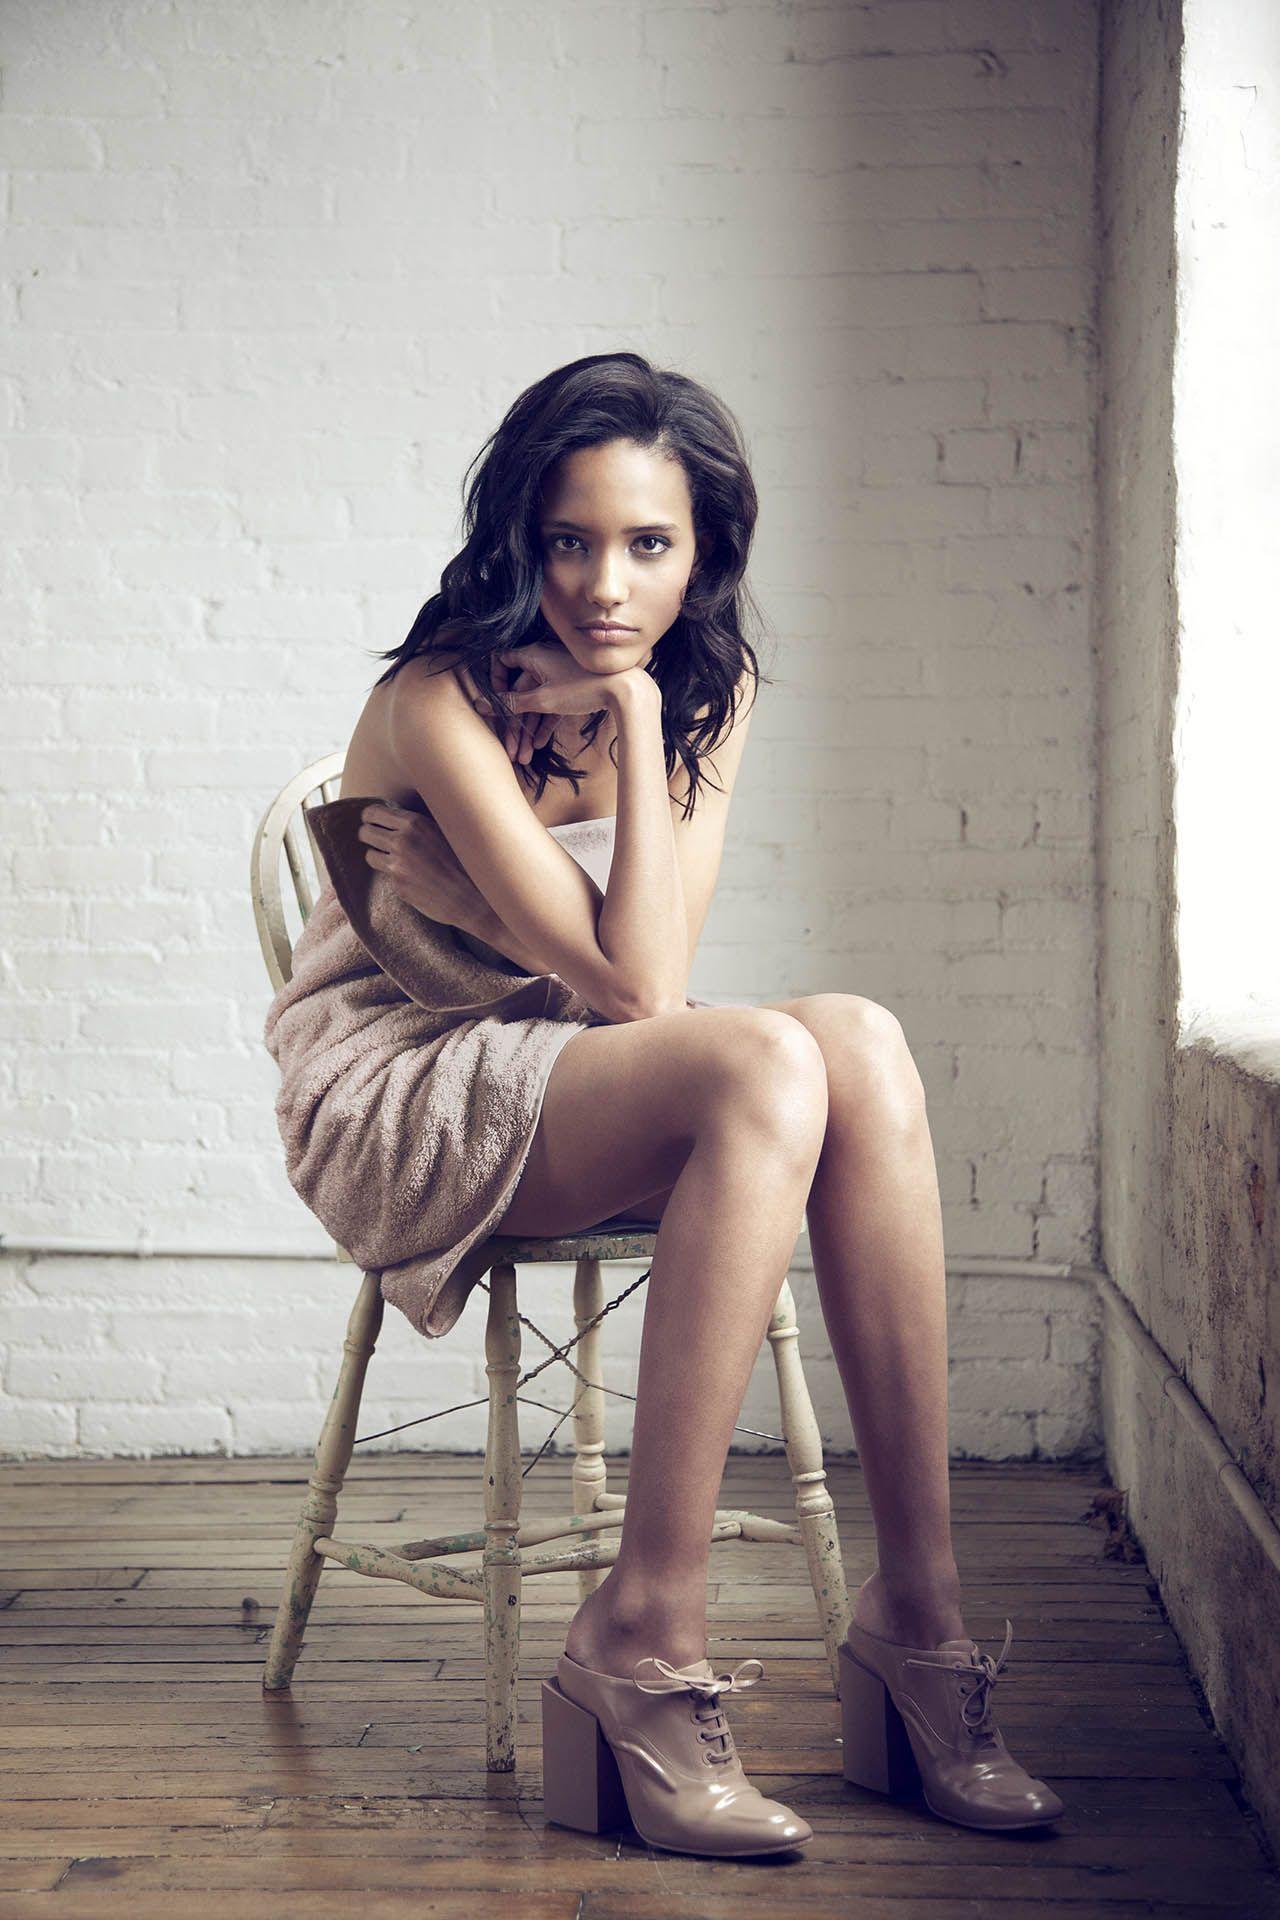 crystal-black-babes: Cora Emmanuel - Skinny Black Beauty